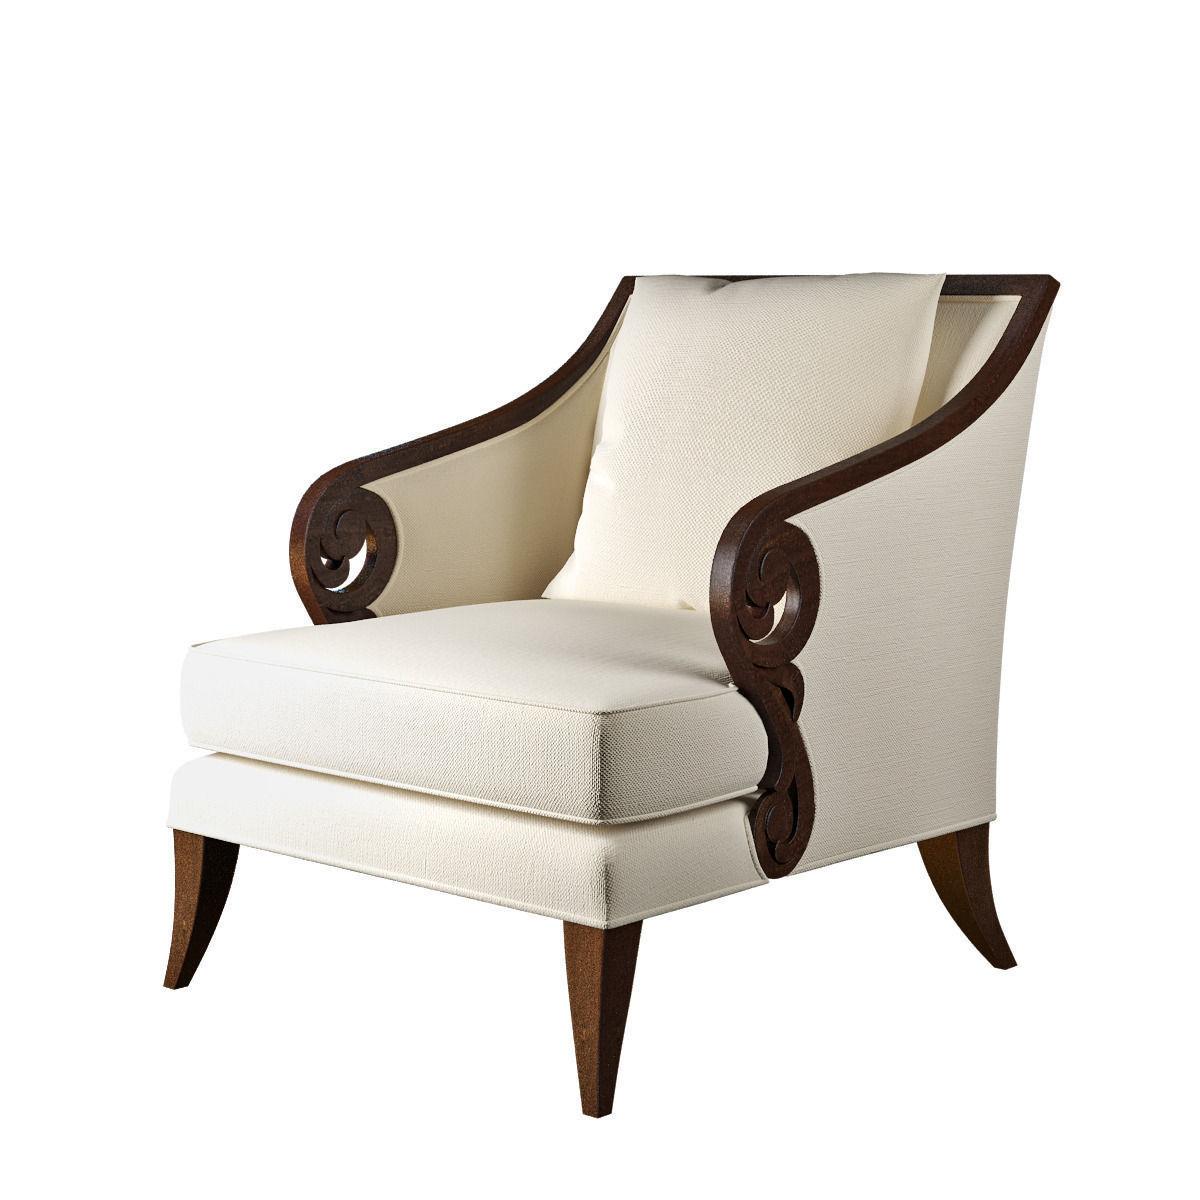 Christopher Guy Furniture Christopher Guy Jude Chair 3d Model Max Obj 3ds Fbx Mtl